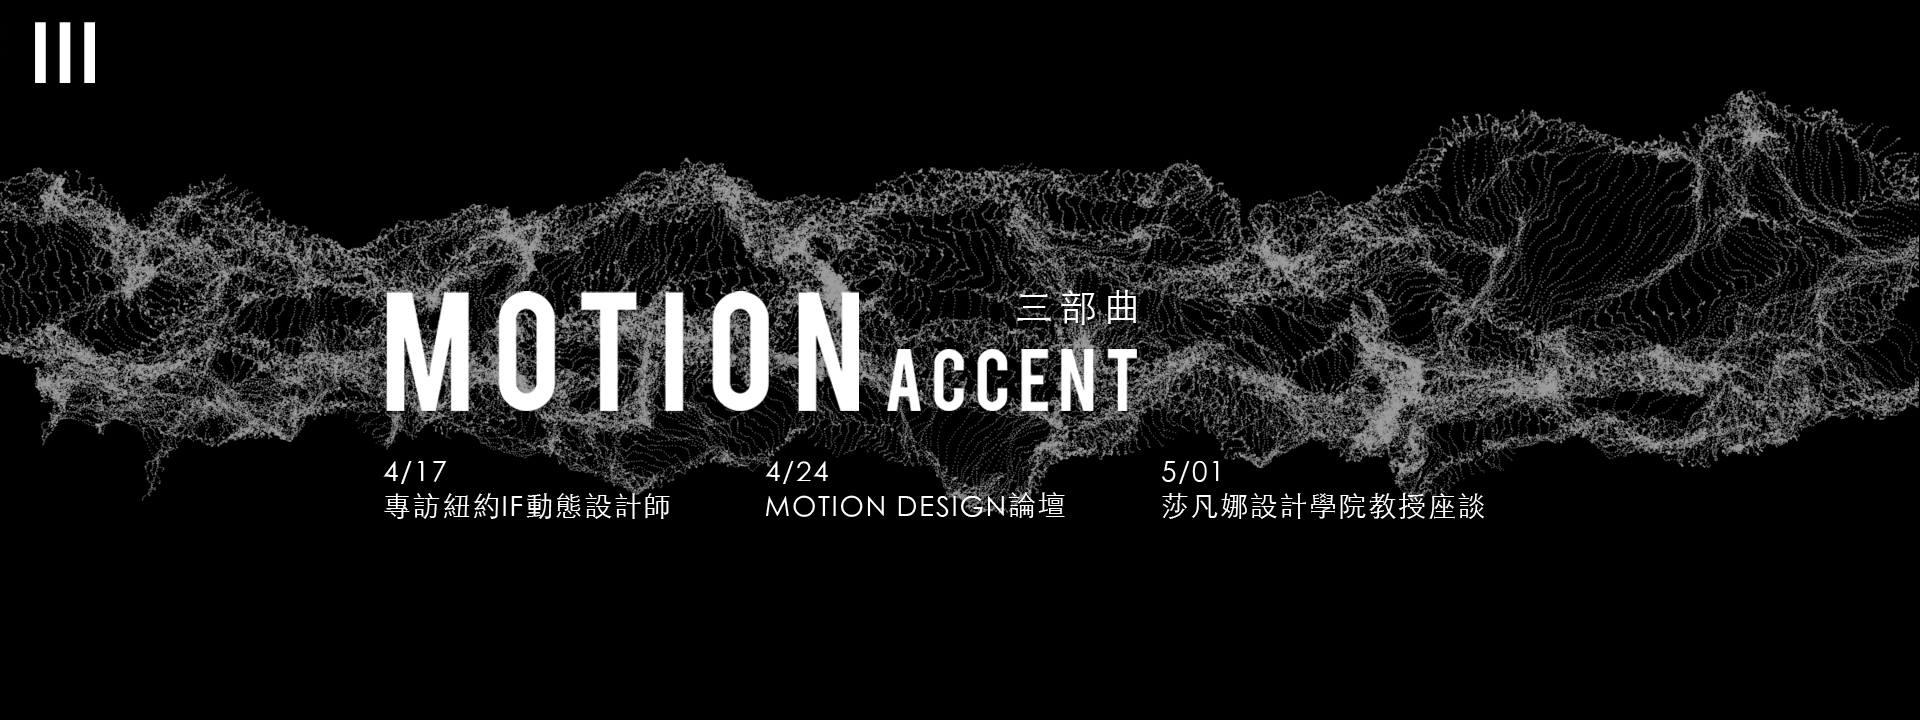 Accent_motion101_2_02.jpg